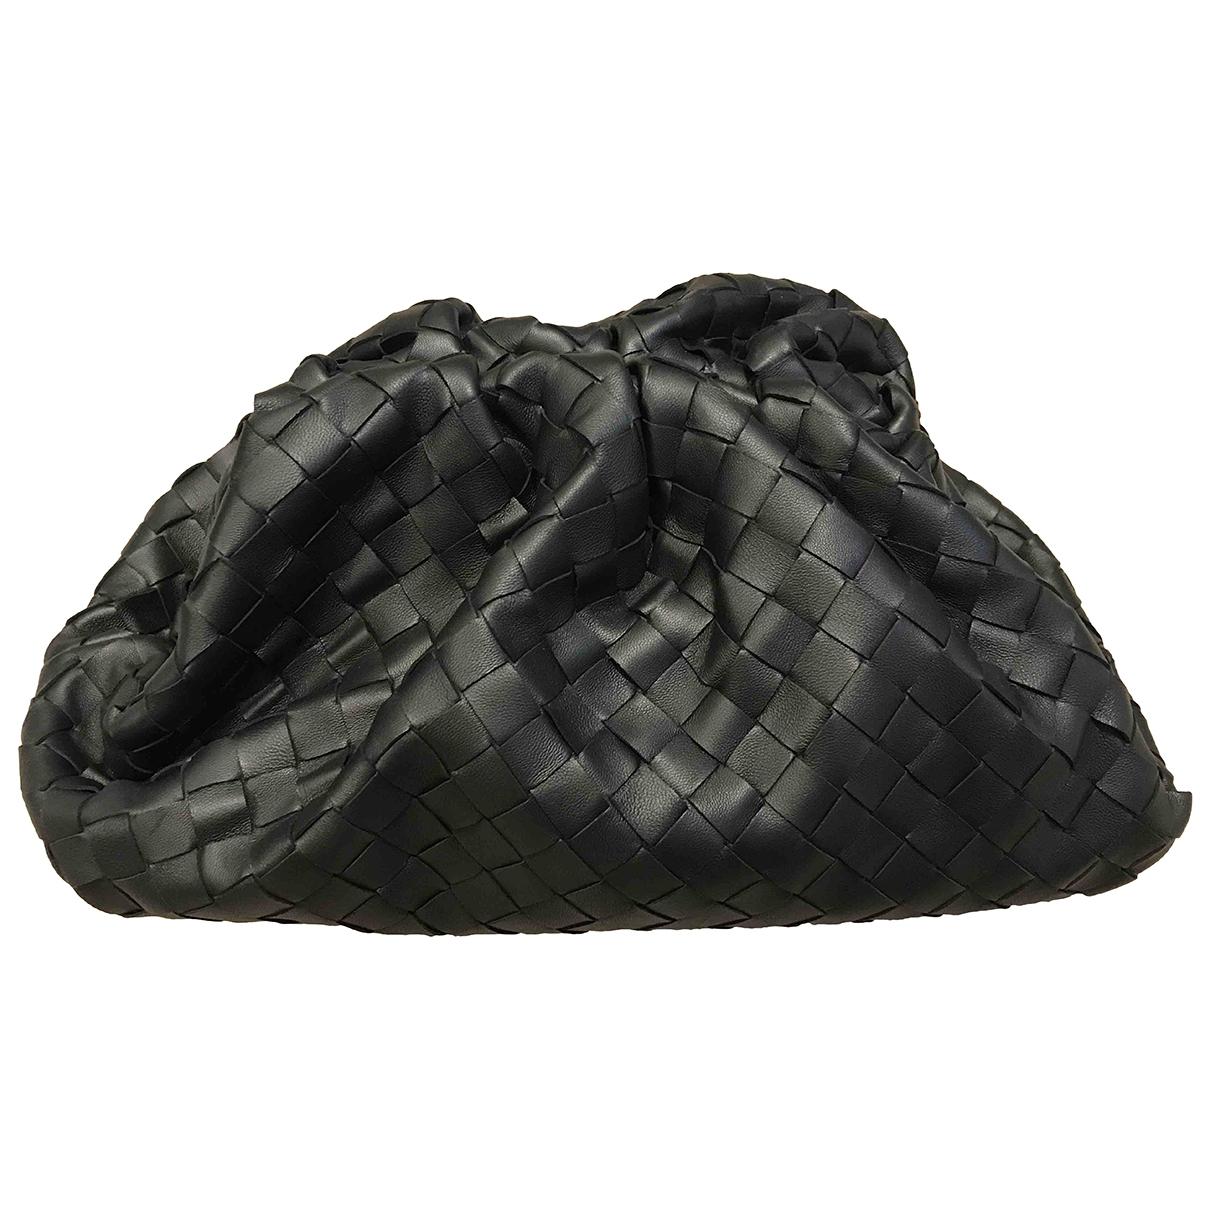 Bottega Veneta Pouch Black Leather Clutch bag for Women \N